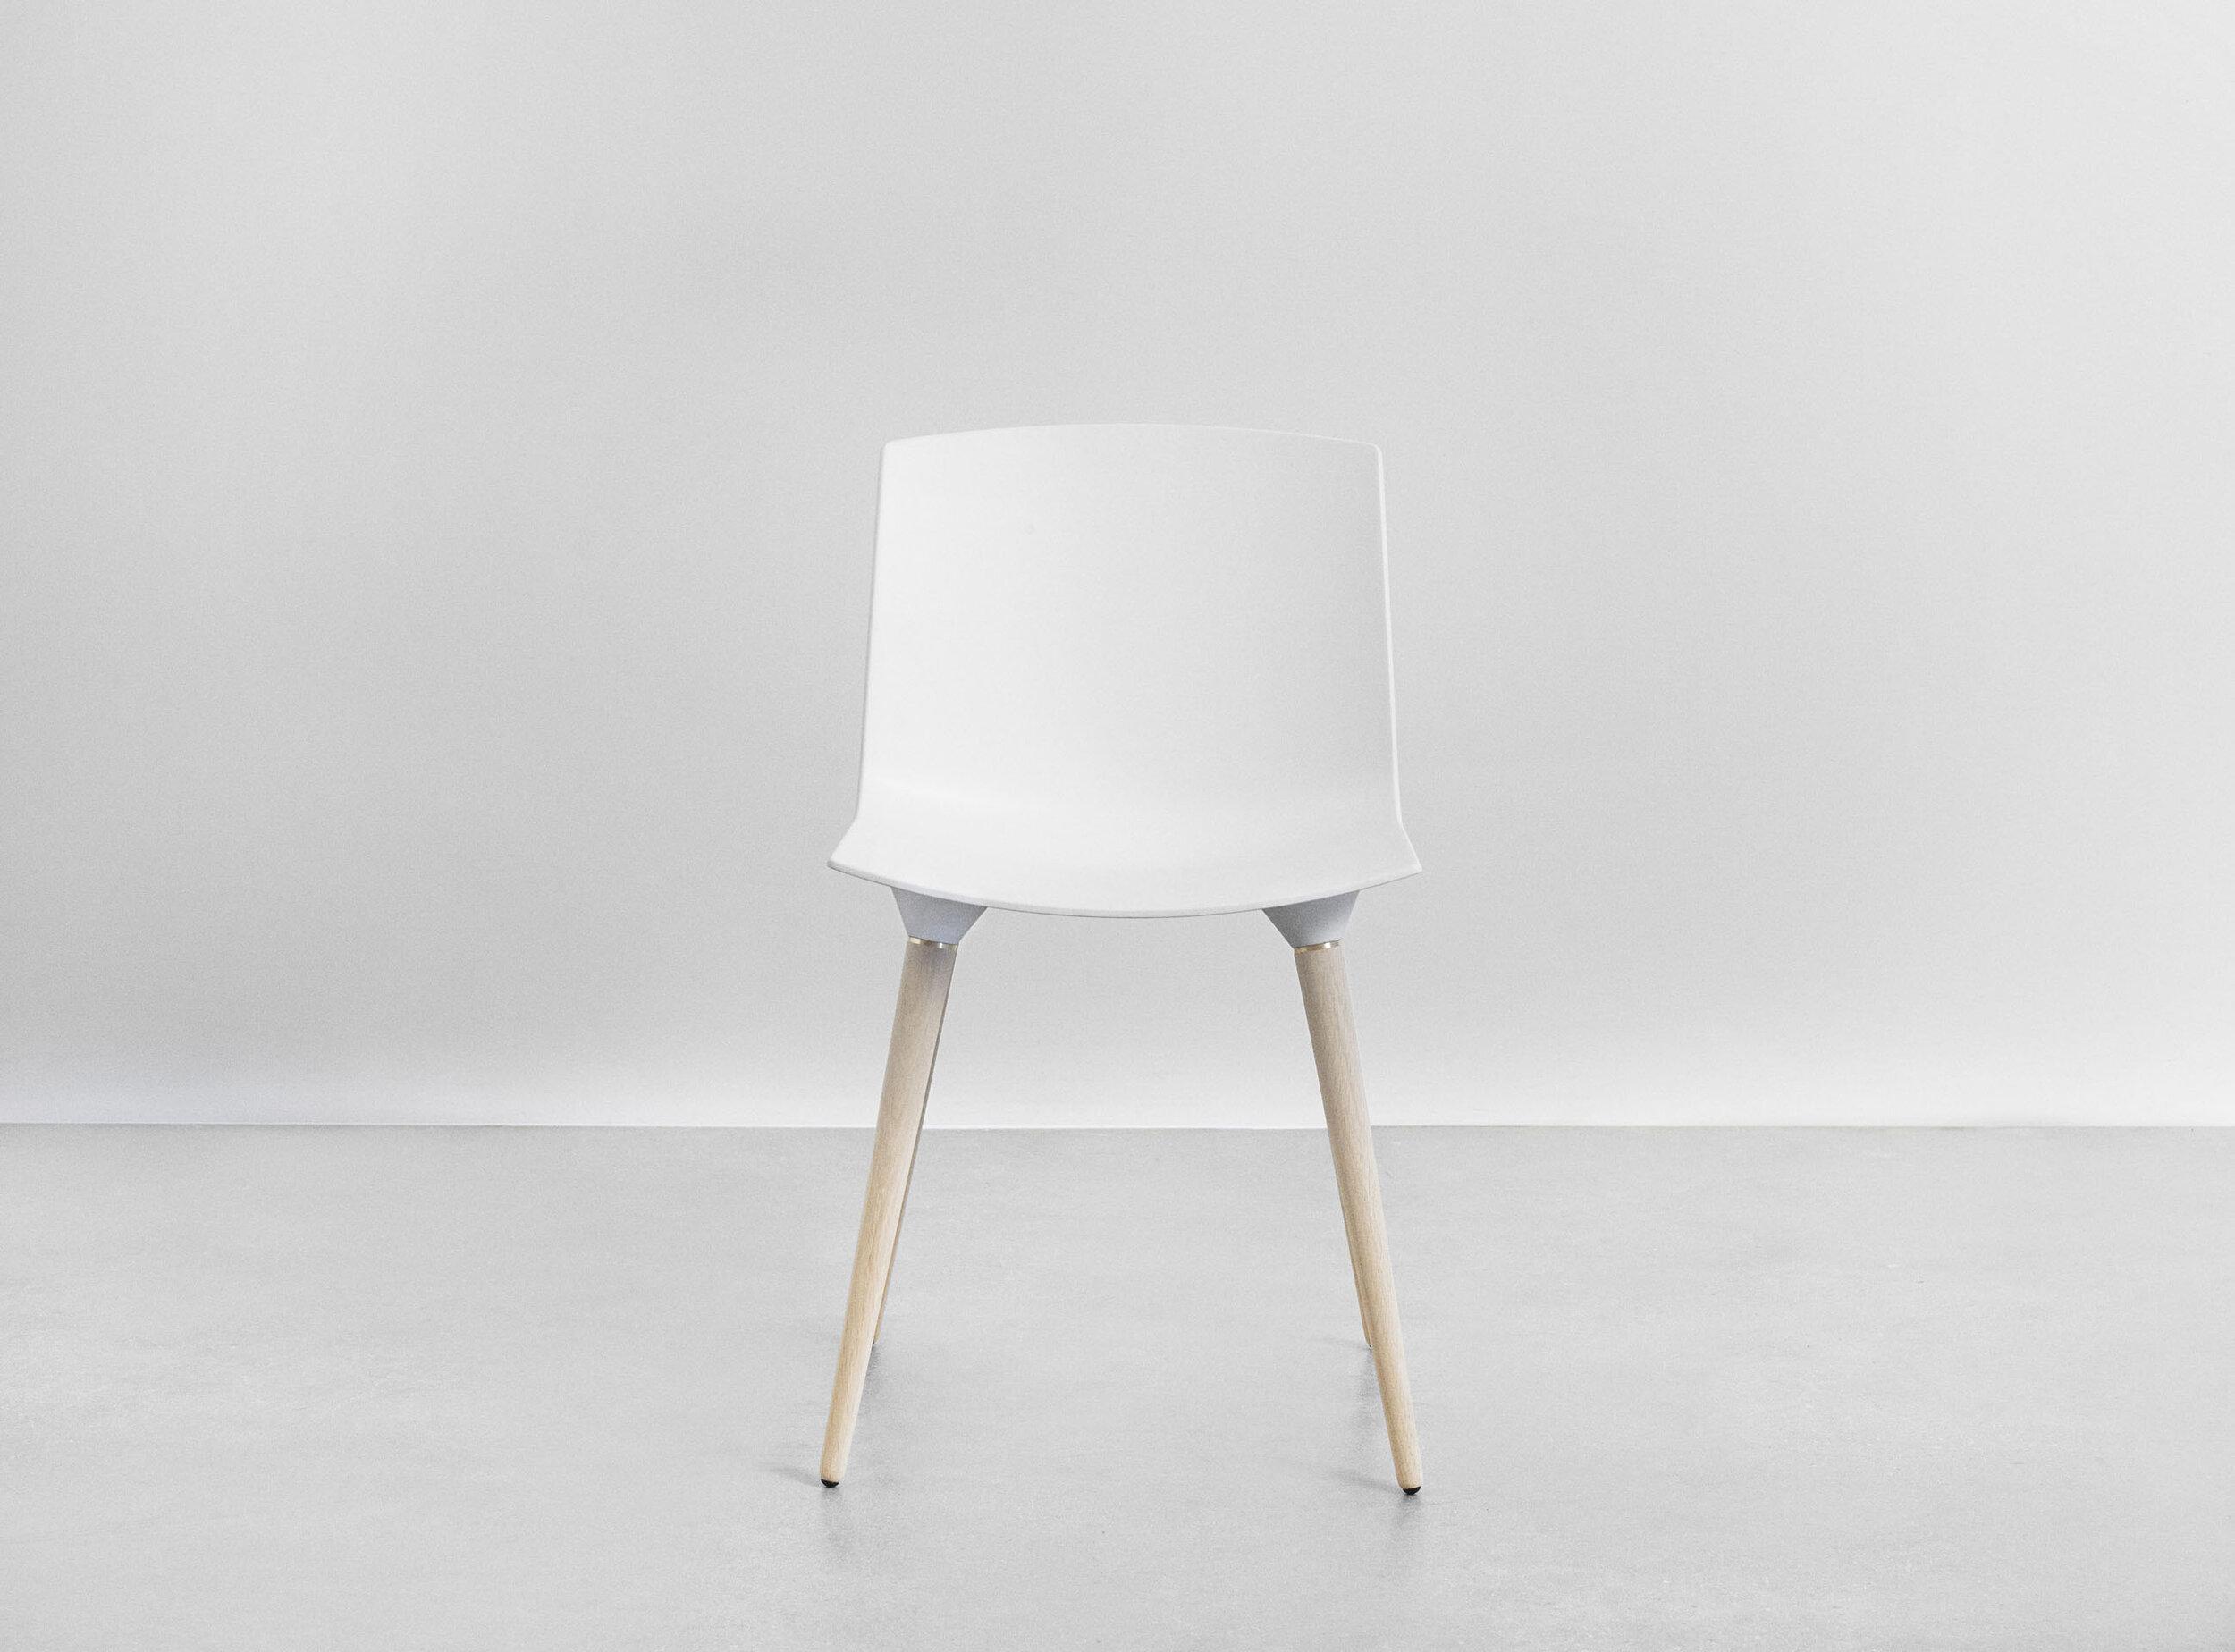 TAC - Andersen furniture